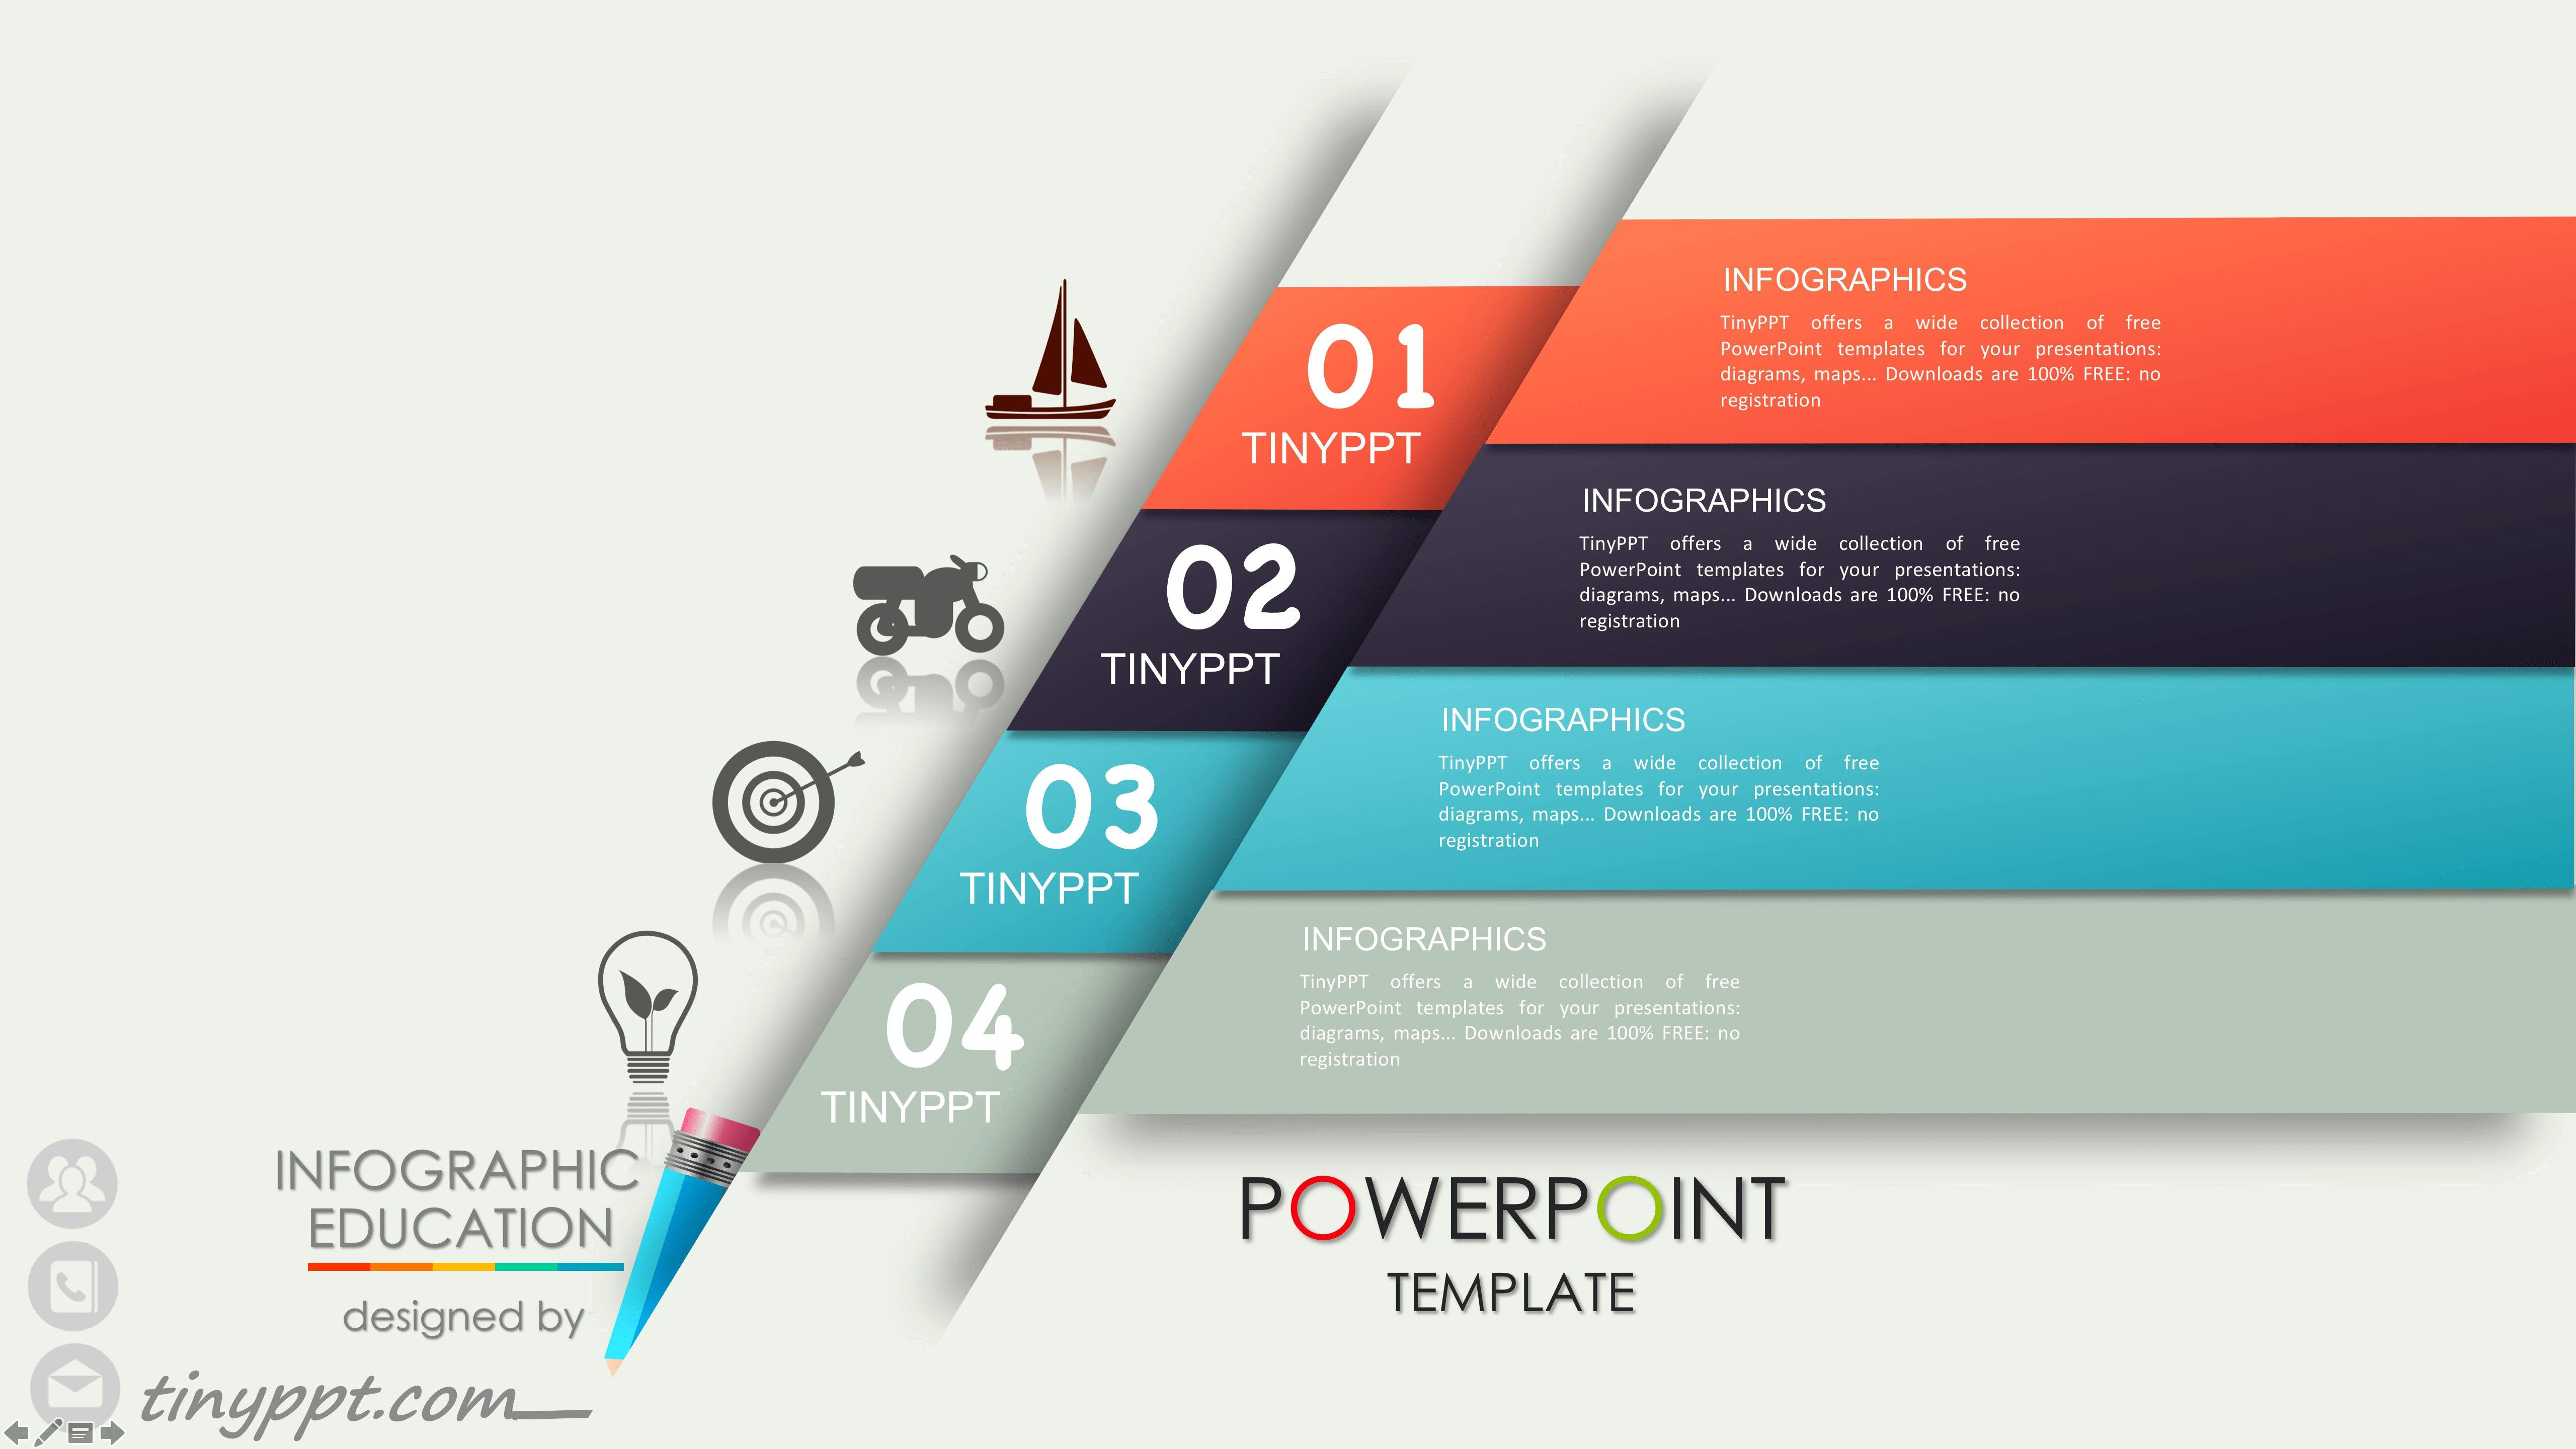 014 Business Proposal Powerpoint Template Free Download Reference Bike Ppt Templates Design Of Buku Ekonomi Template Cv Kreatif